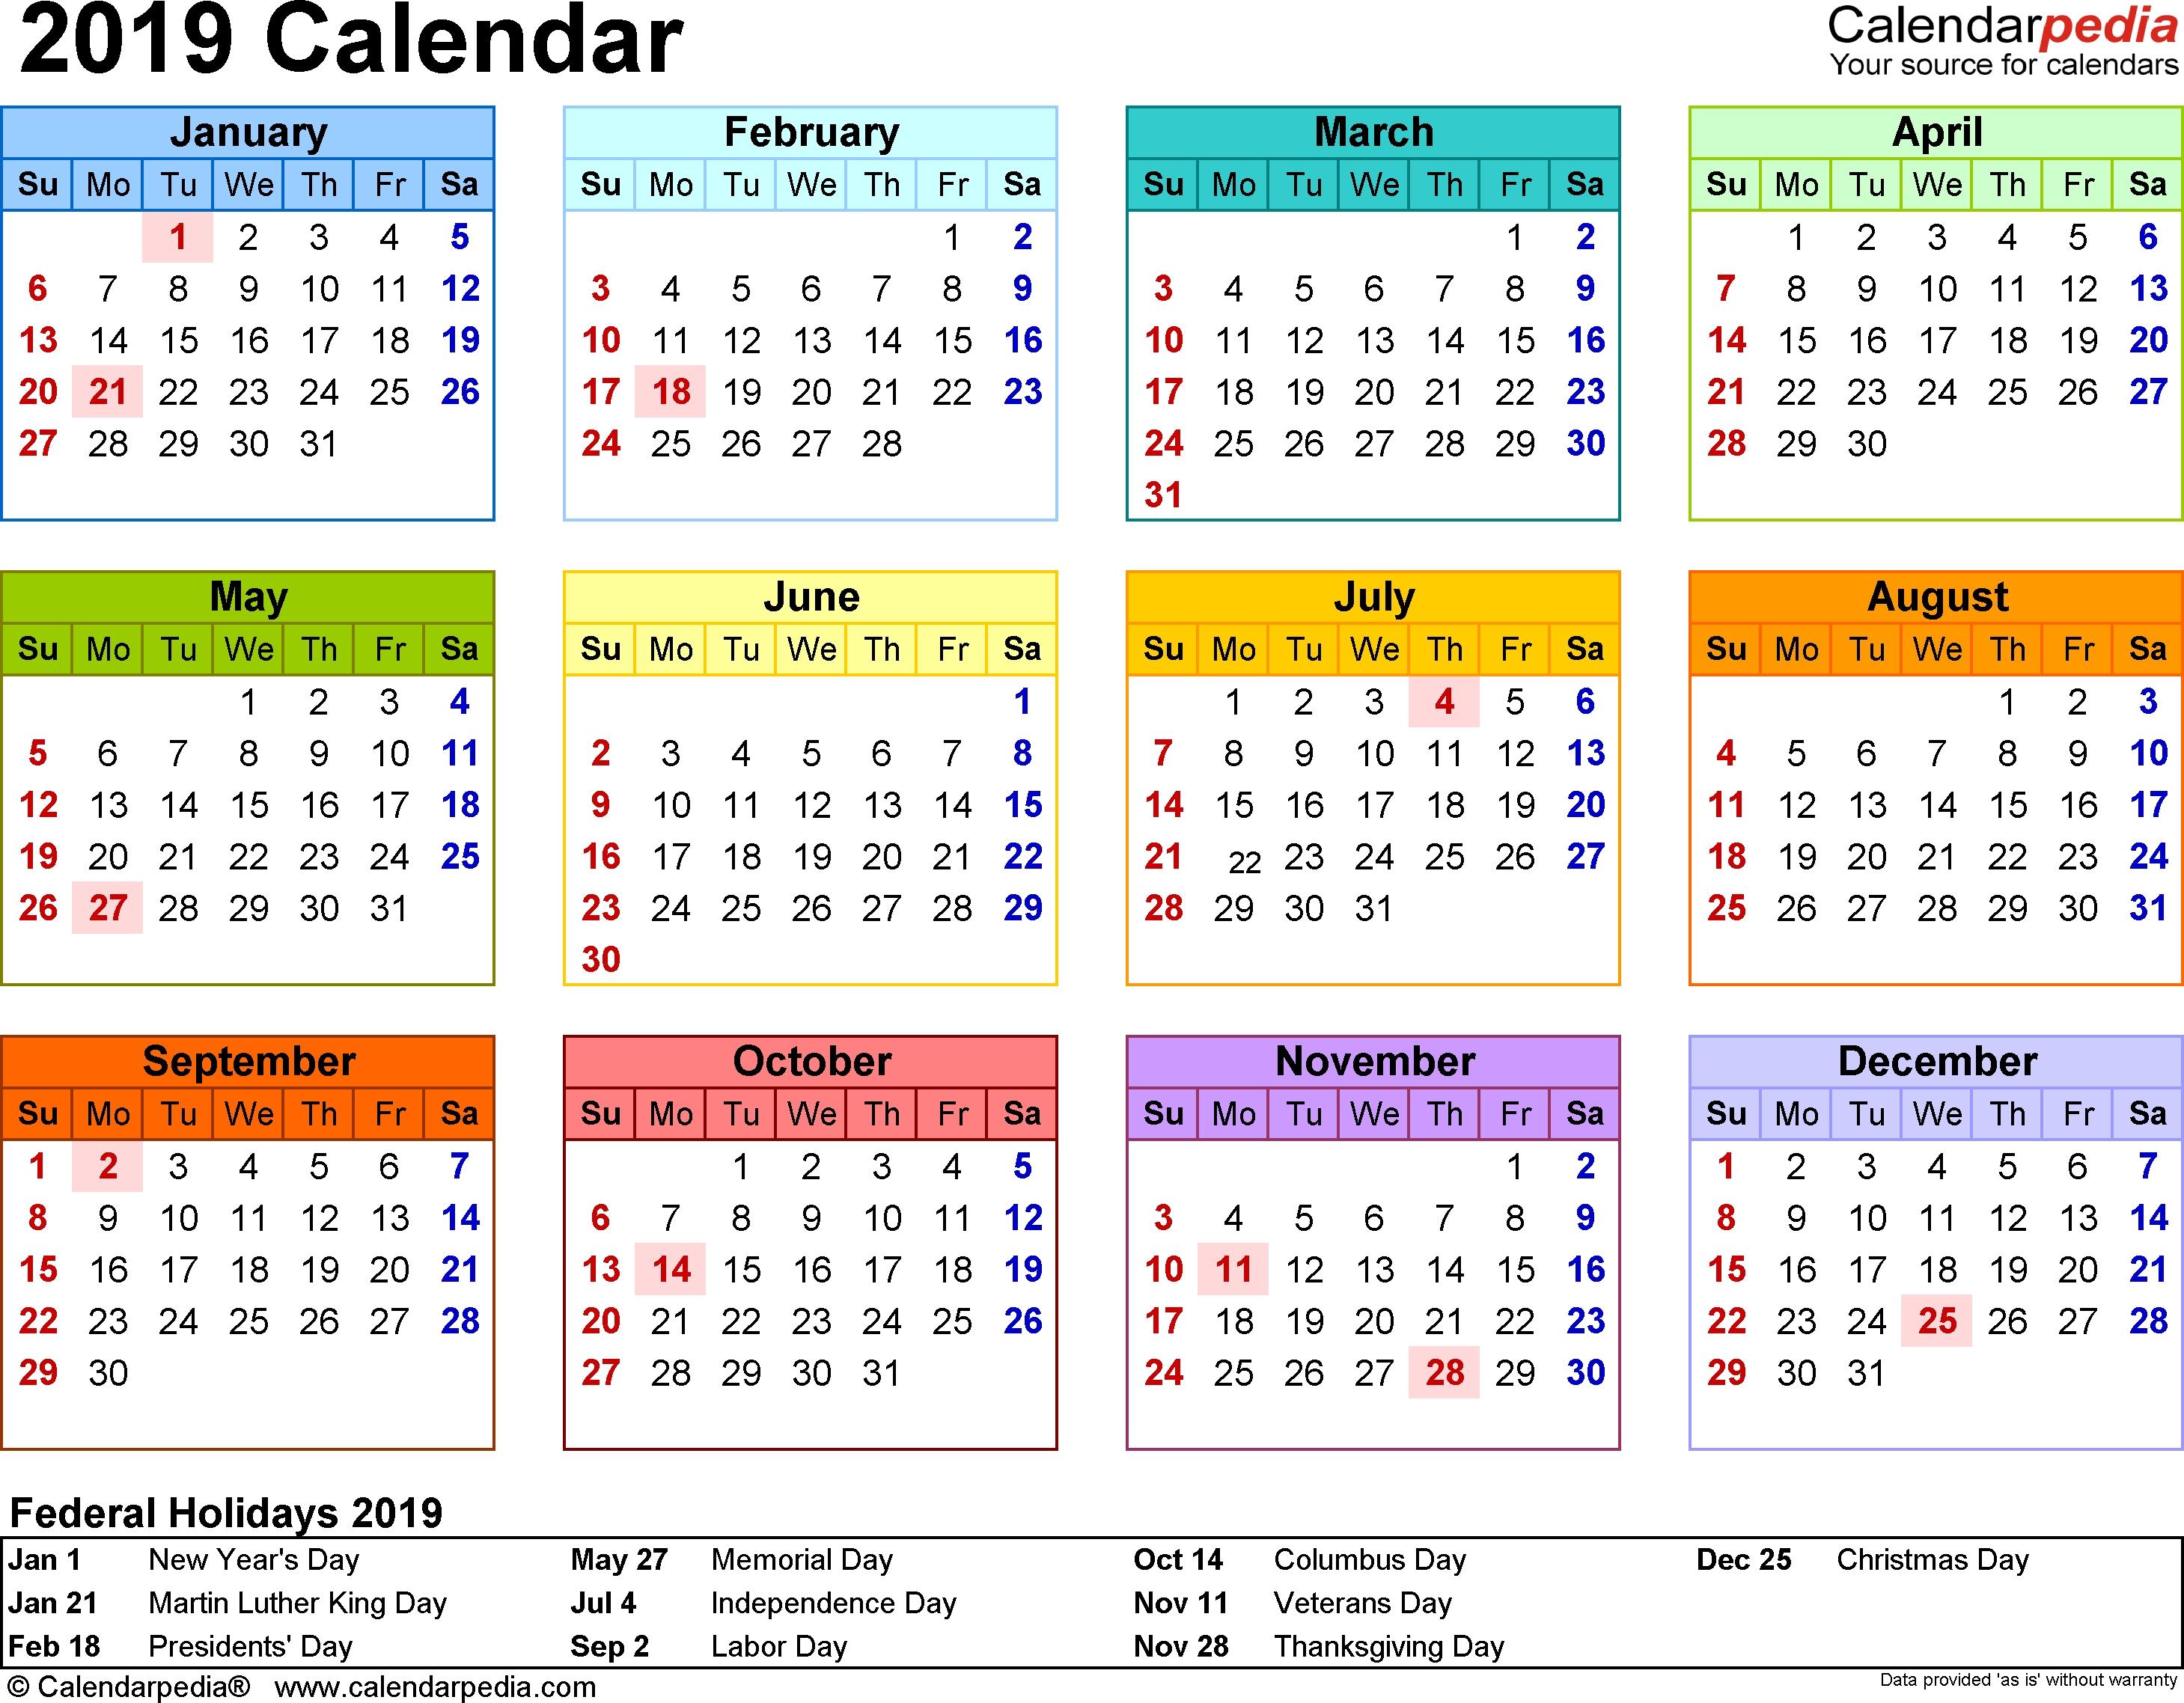 2019 Calendar - Free Printable Microsoft Word Templates Printable Desk Calender South Africa